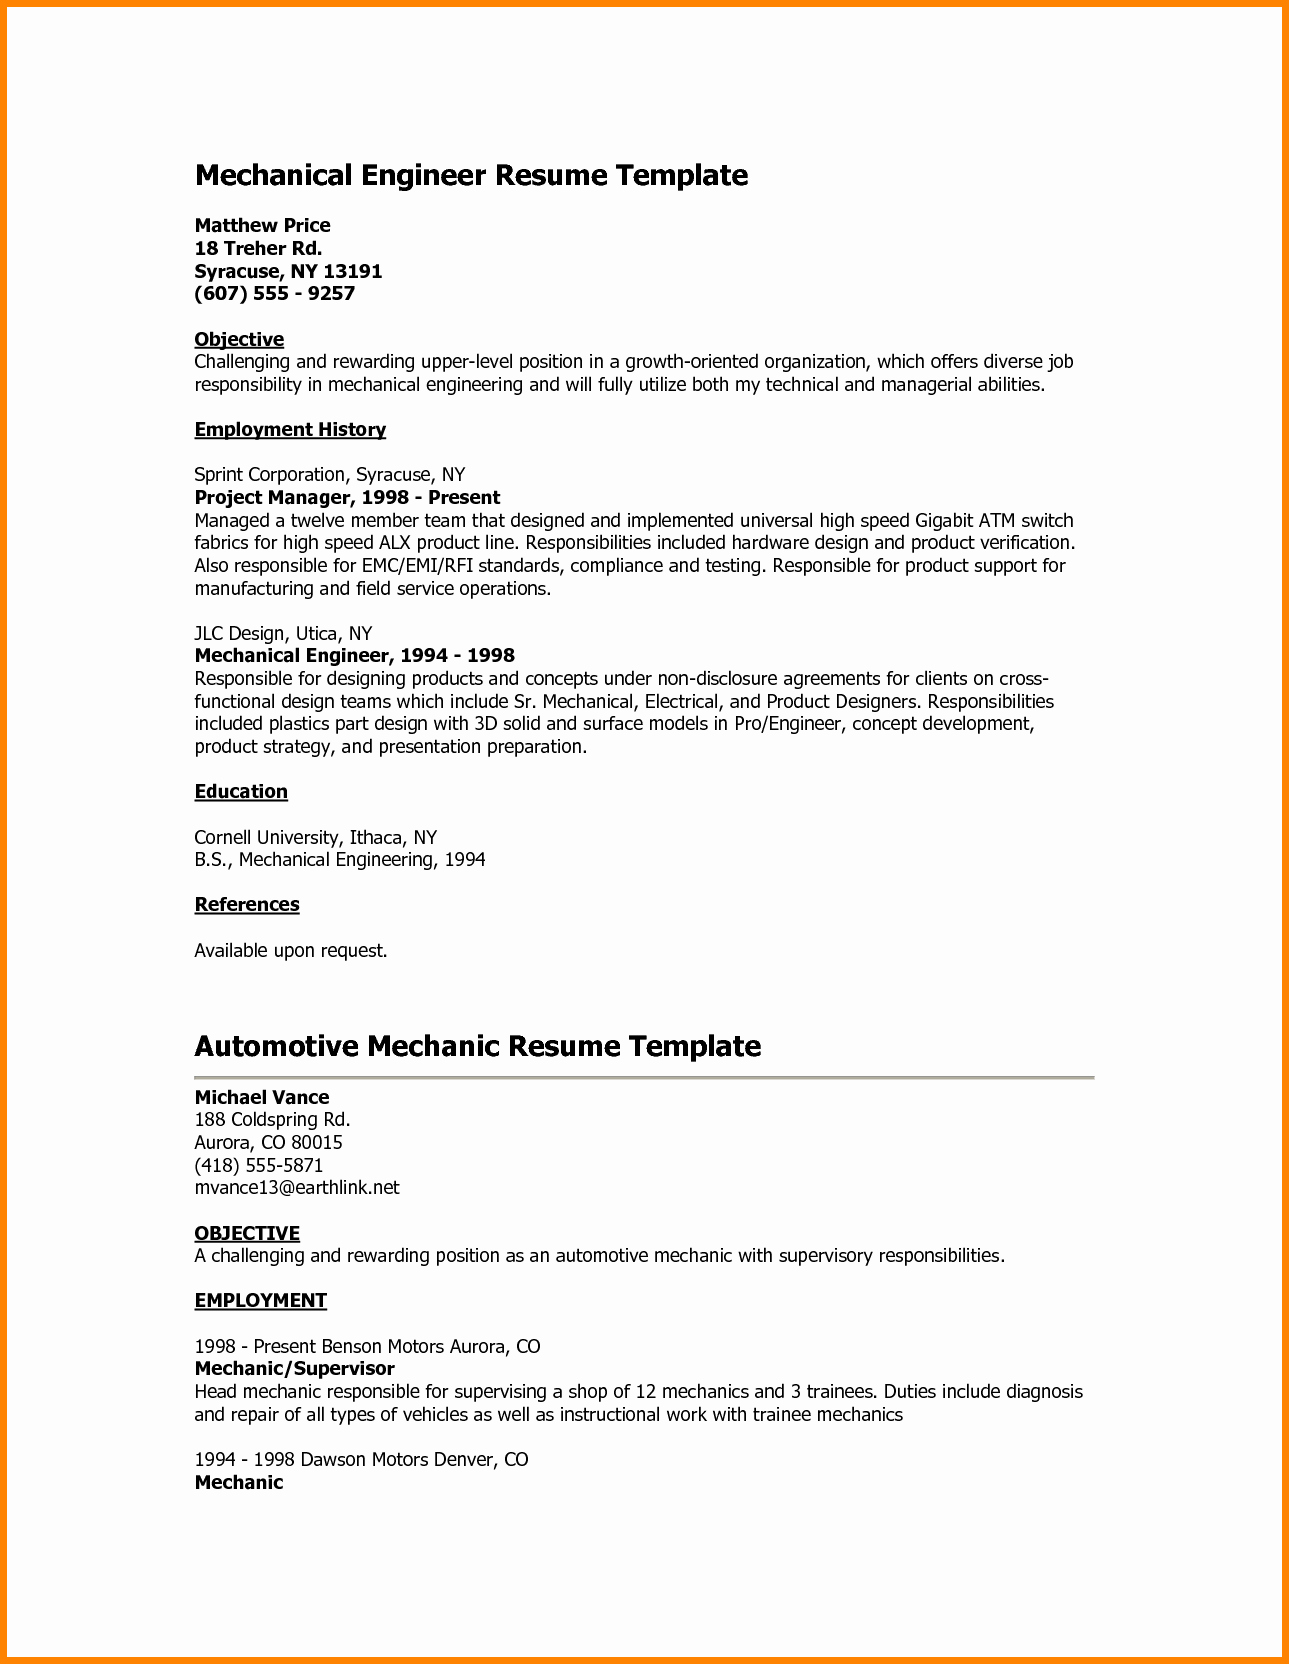 Mechanical Engineer Resume Objective Examples Sidemcicek